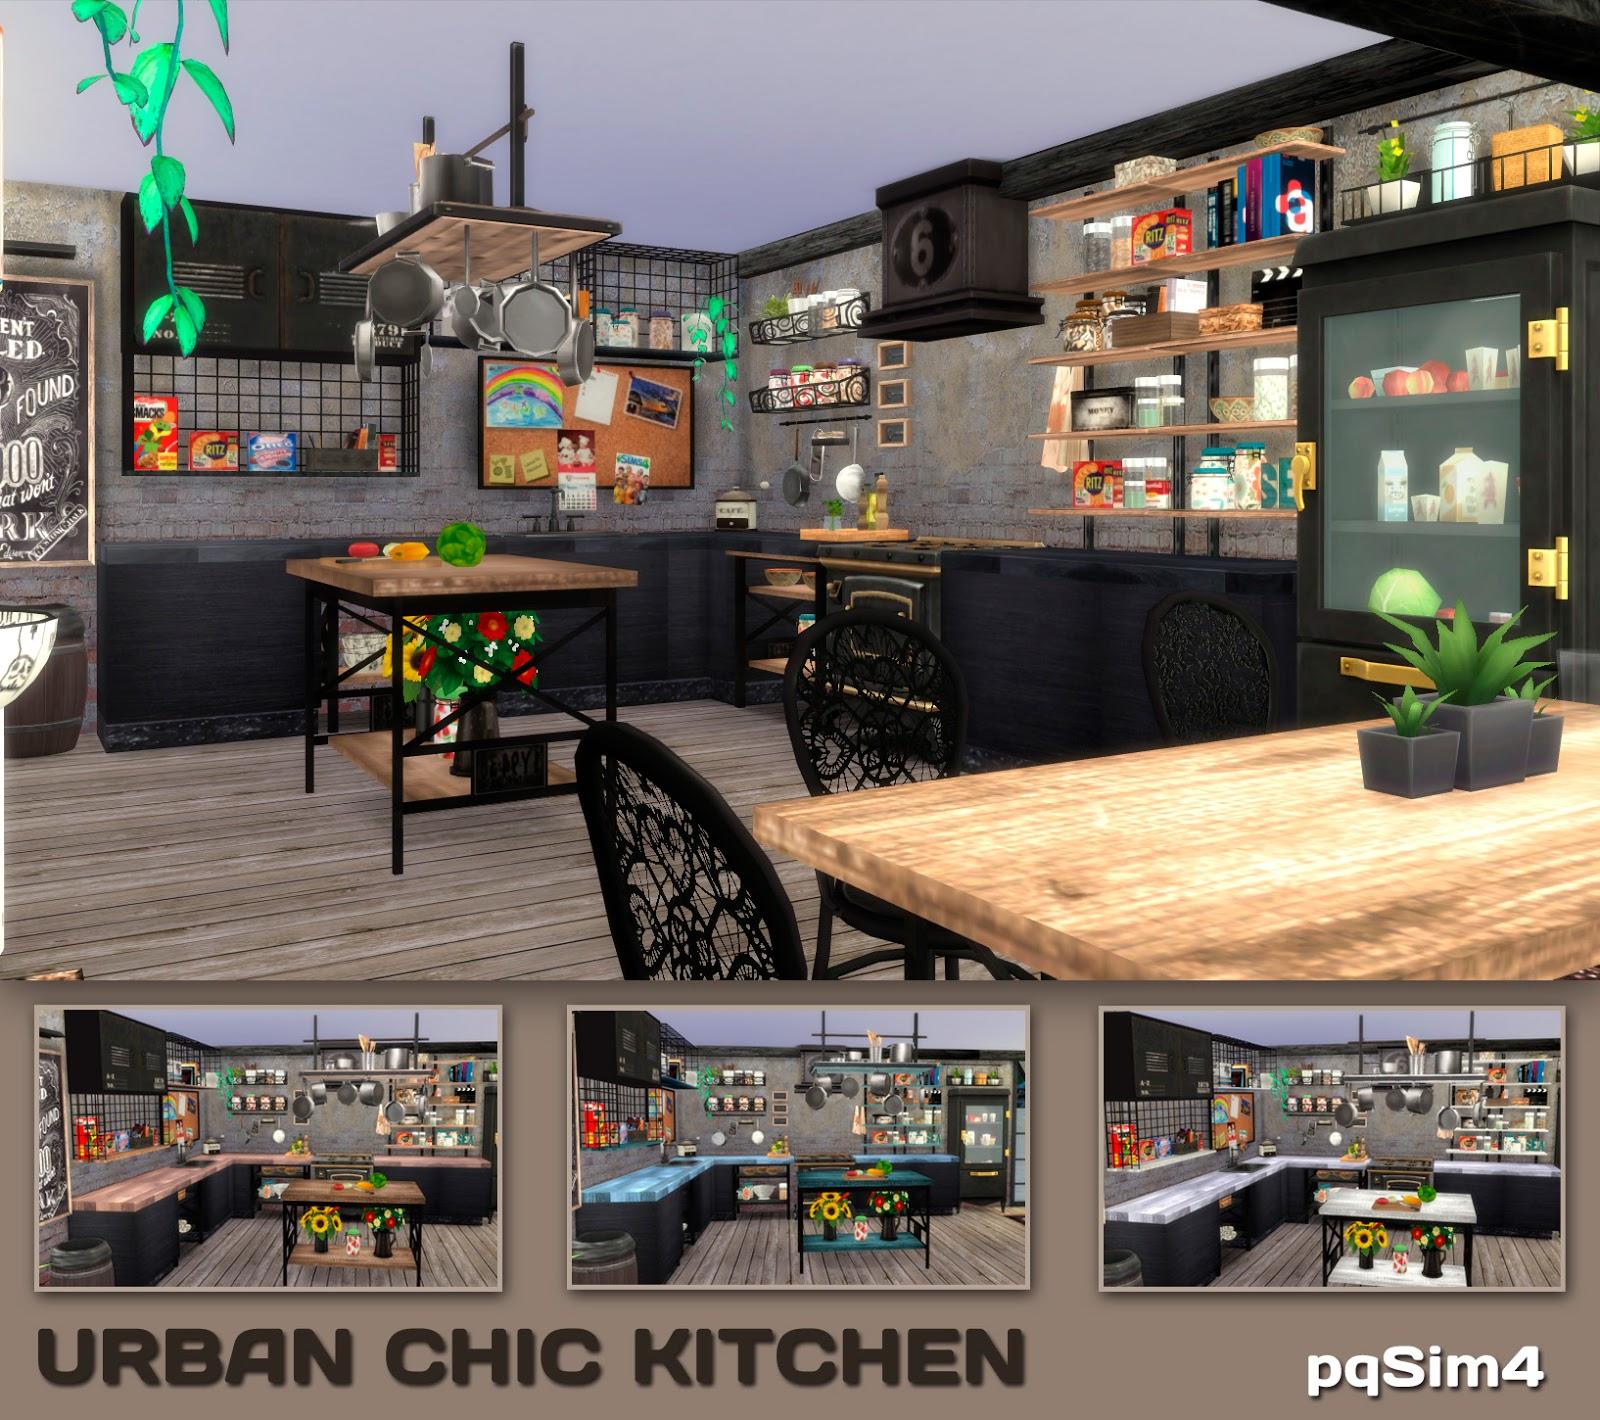 Sims 4 cc 39 s the best urban chic kitchen set by pqsim4 - Muebles urban chic ...